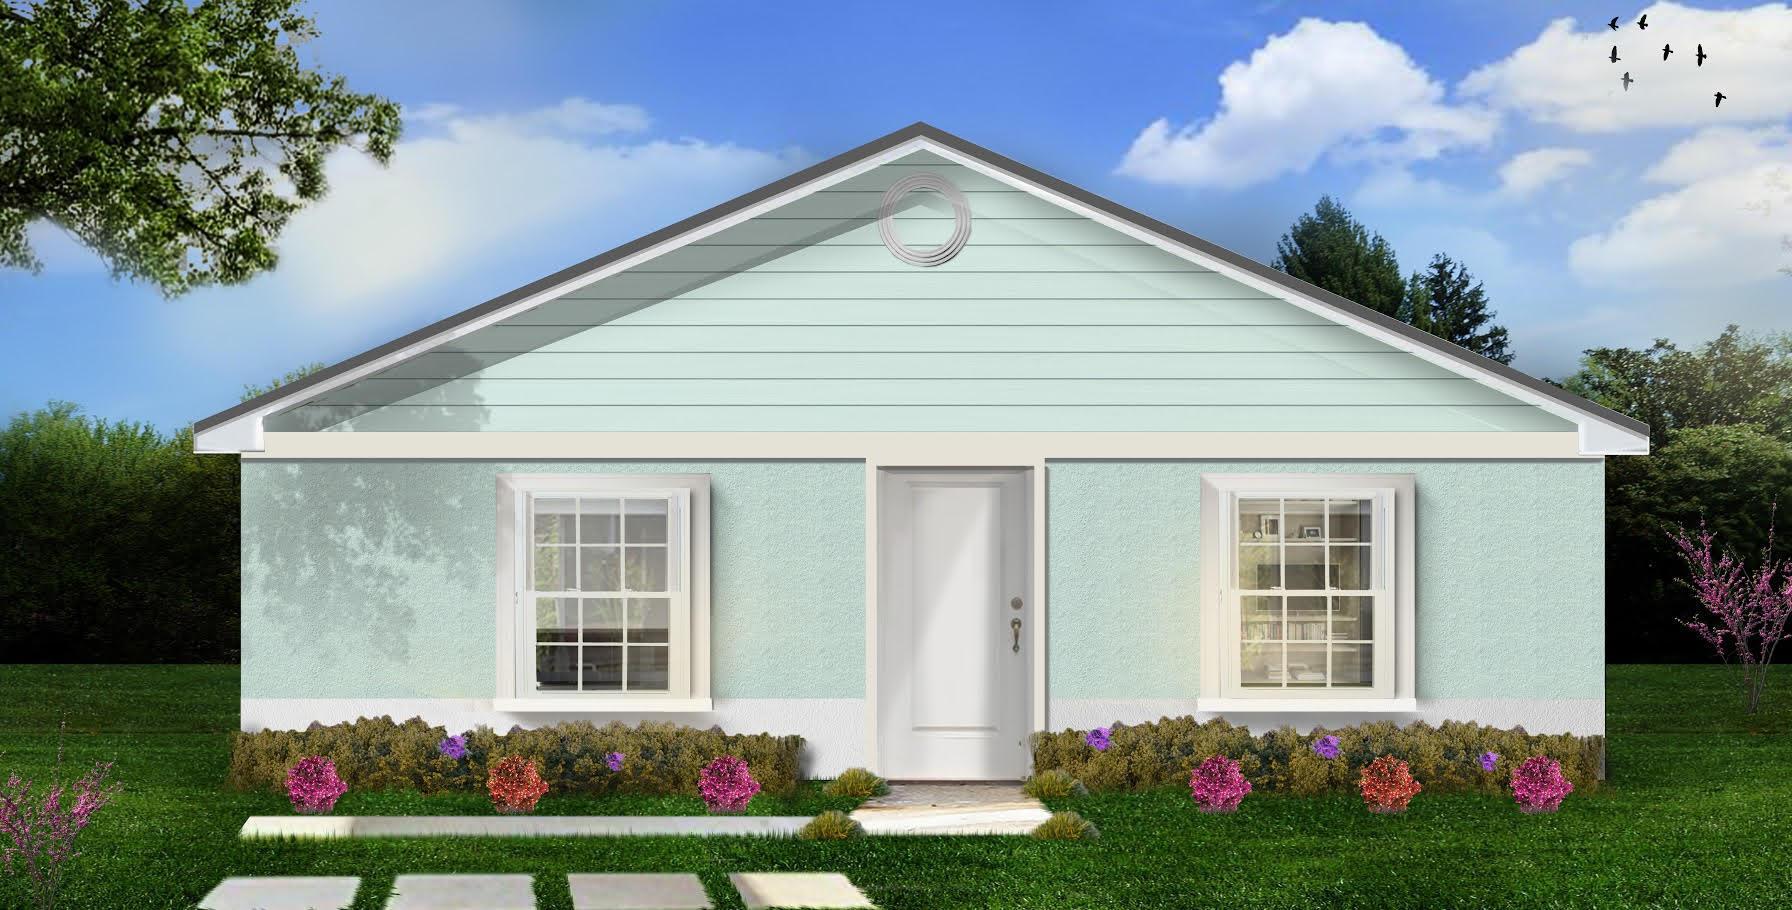 Details for 512 Lilac Court, West Palm Beach, FL 33407